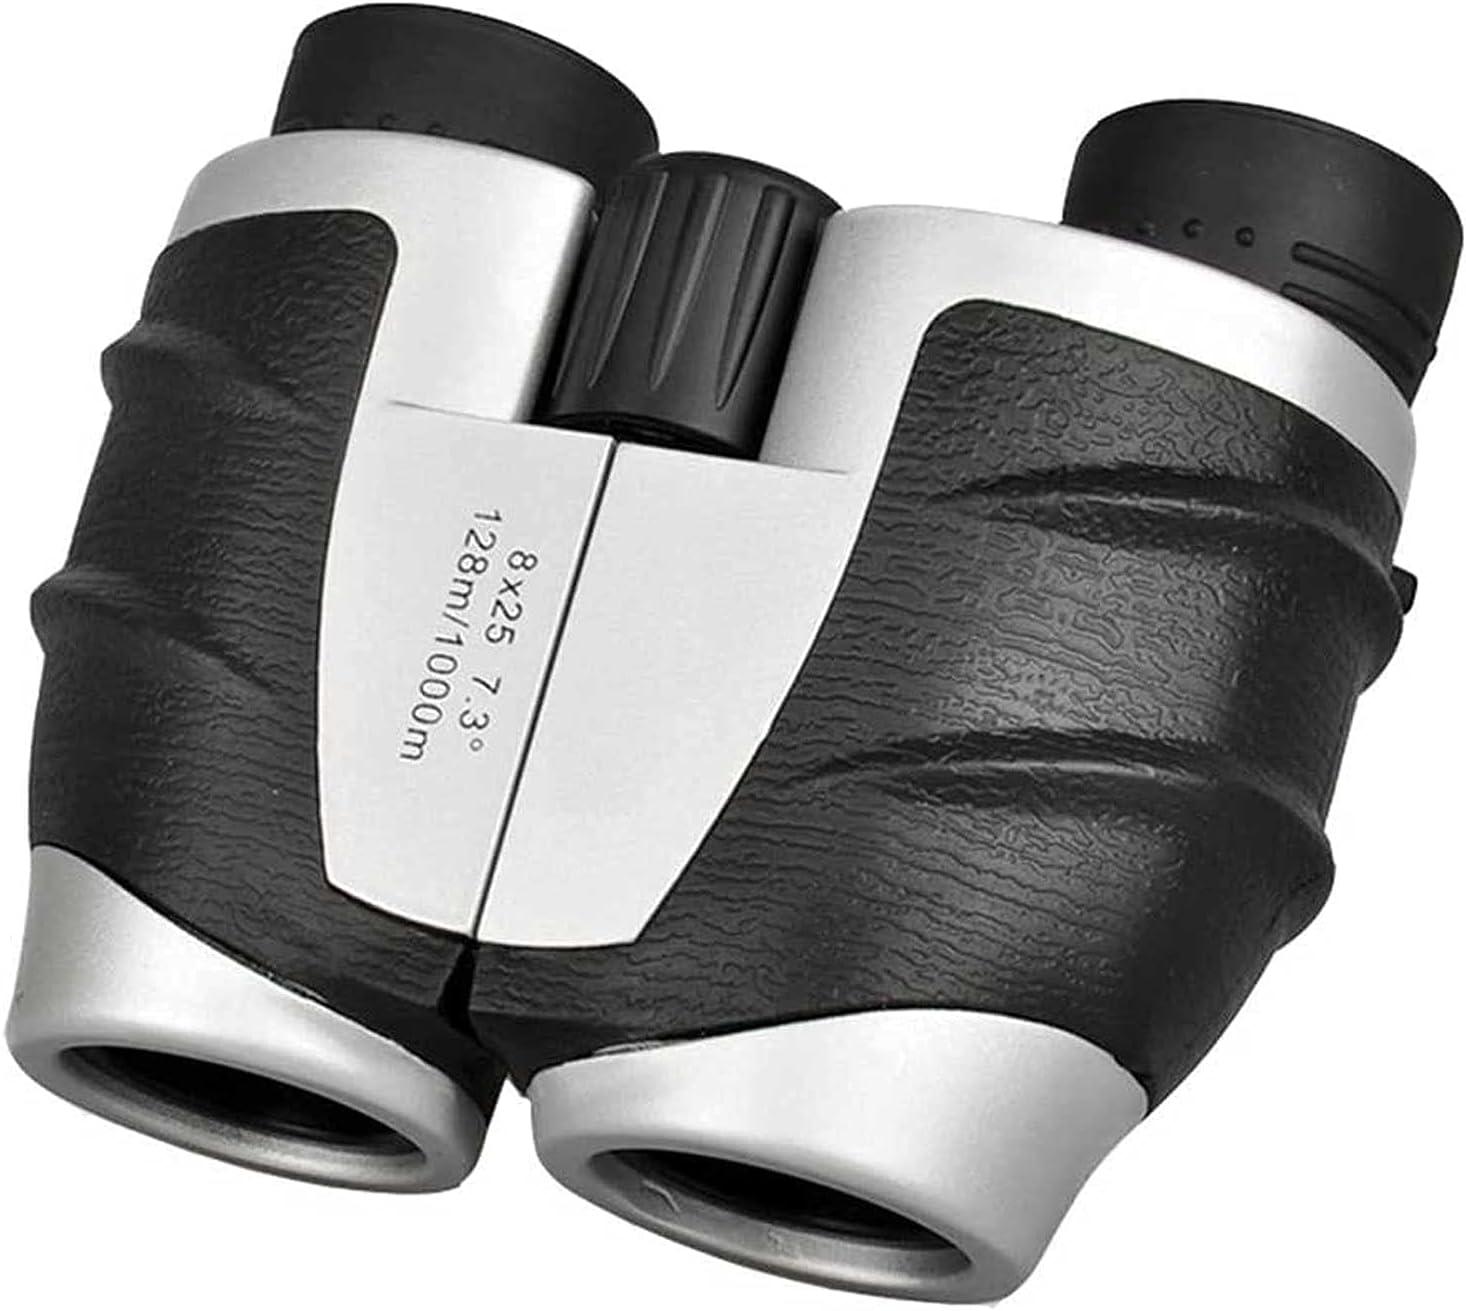 TTSHOP Binoculars for Adults Bi Online 5 ☆ very popular limited product Kids Adesign 8x25